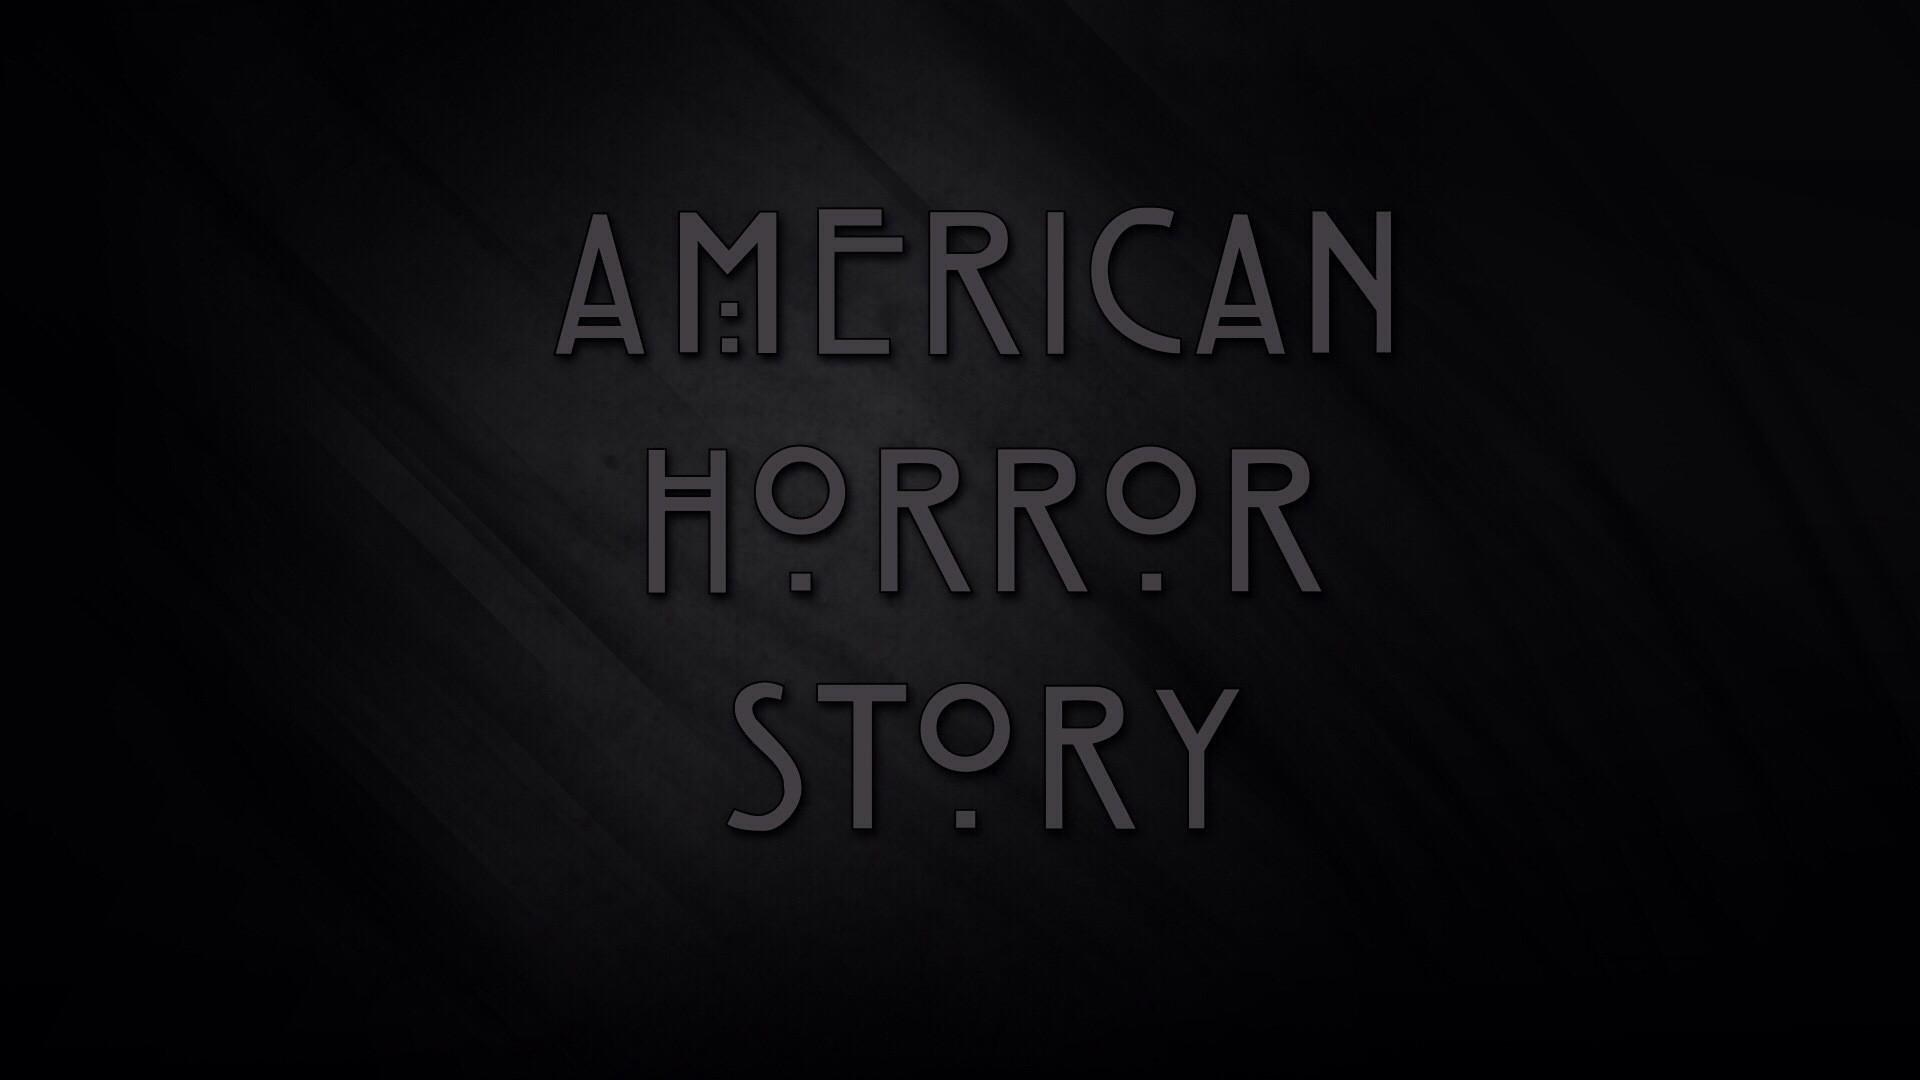 american horror story logo desktop wallpaper 65227